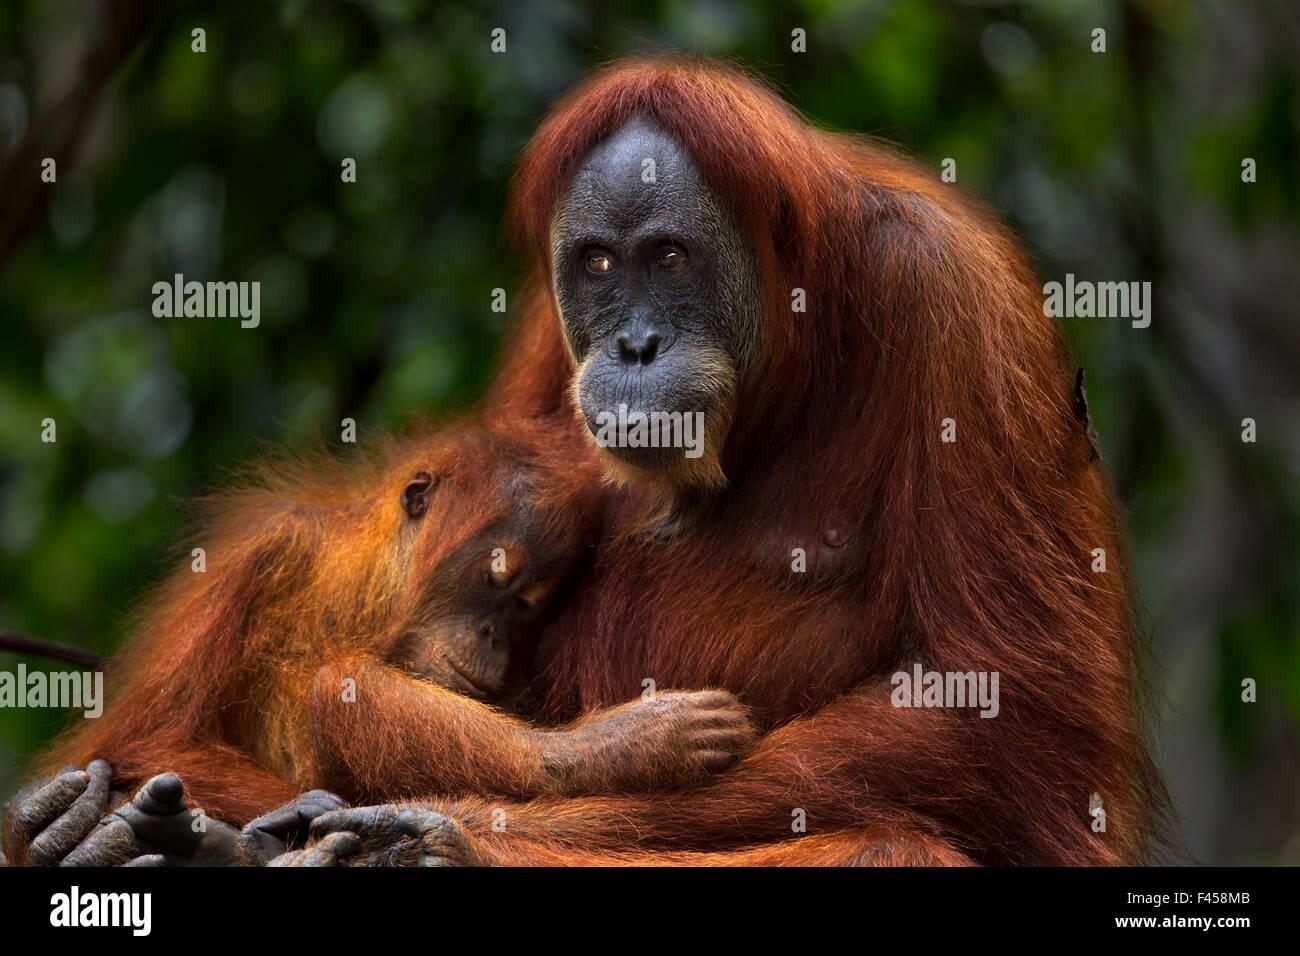 Sumatran orangutan (Pongo abelii) female 'Ratna' aged 24 years sitting with her baby daughter 'Global' - Stock Image